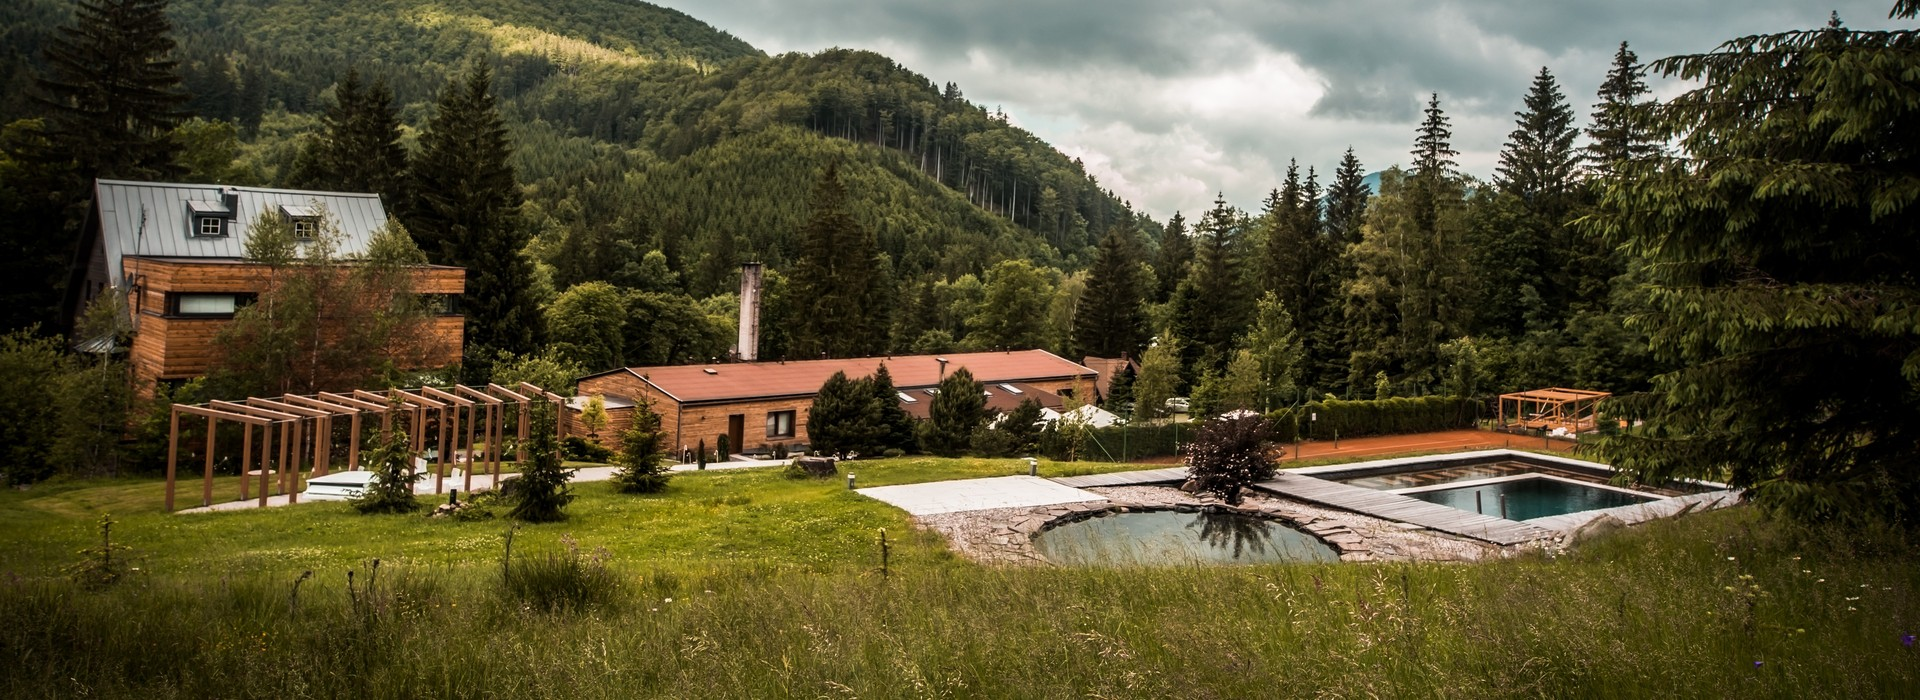 Hotel & Garden U Holubu